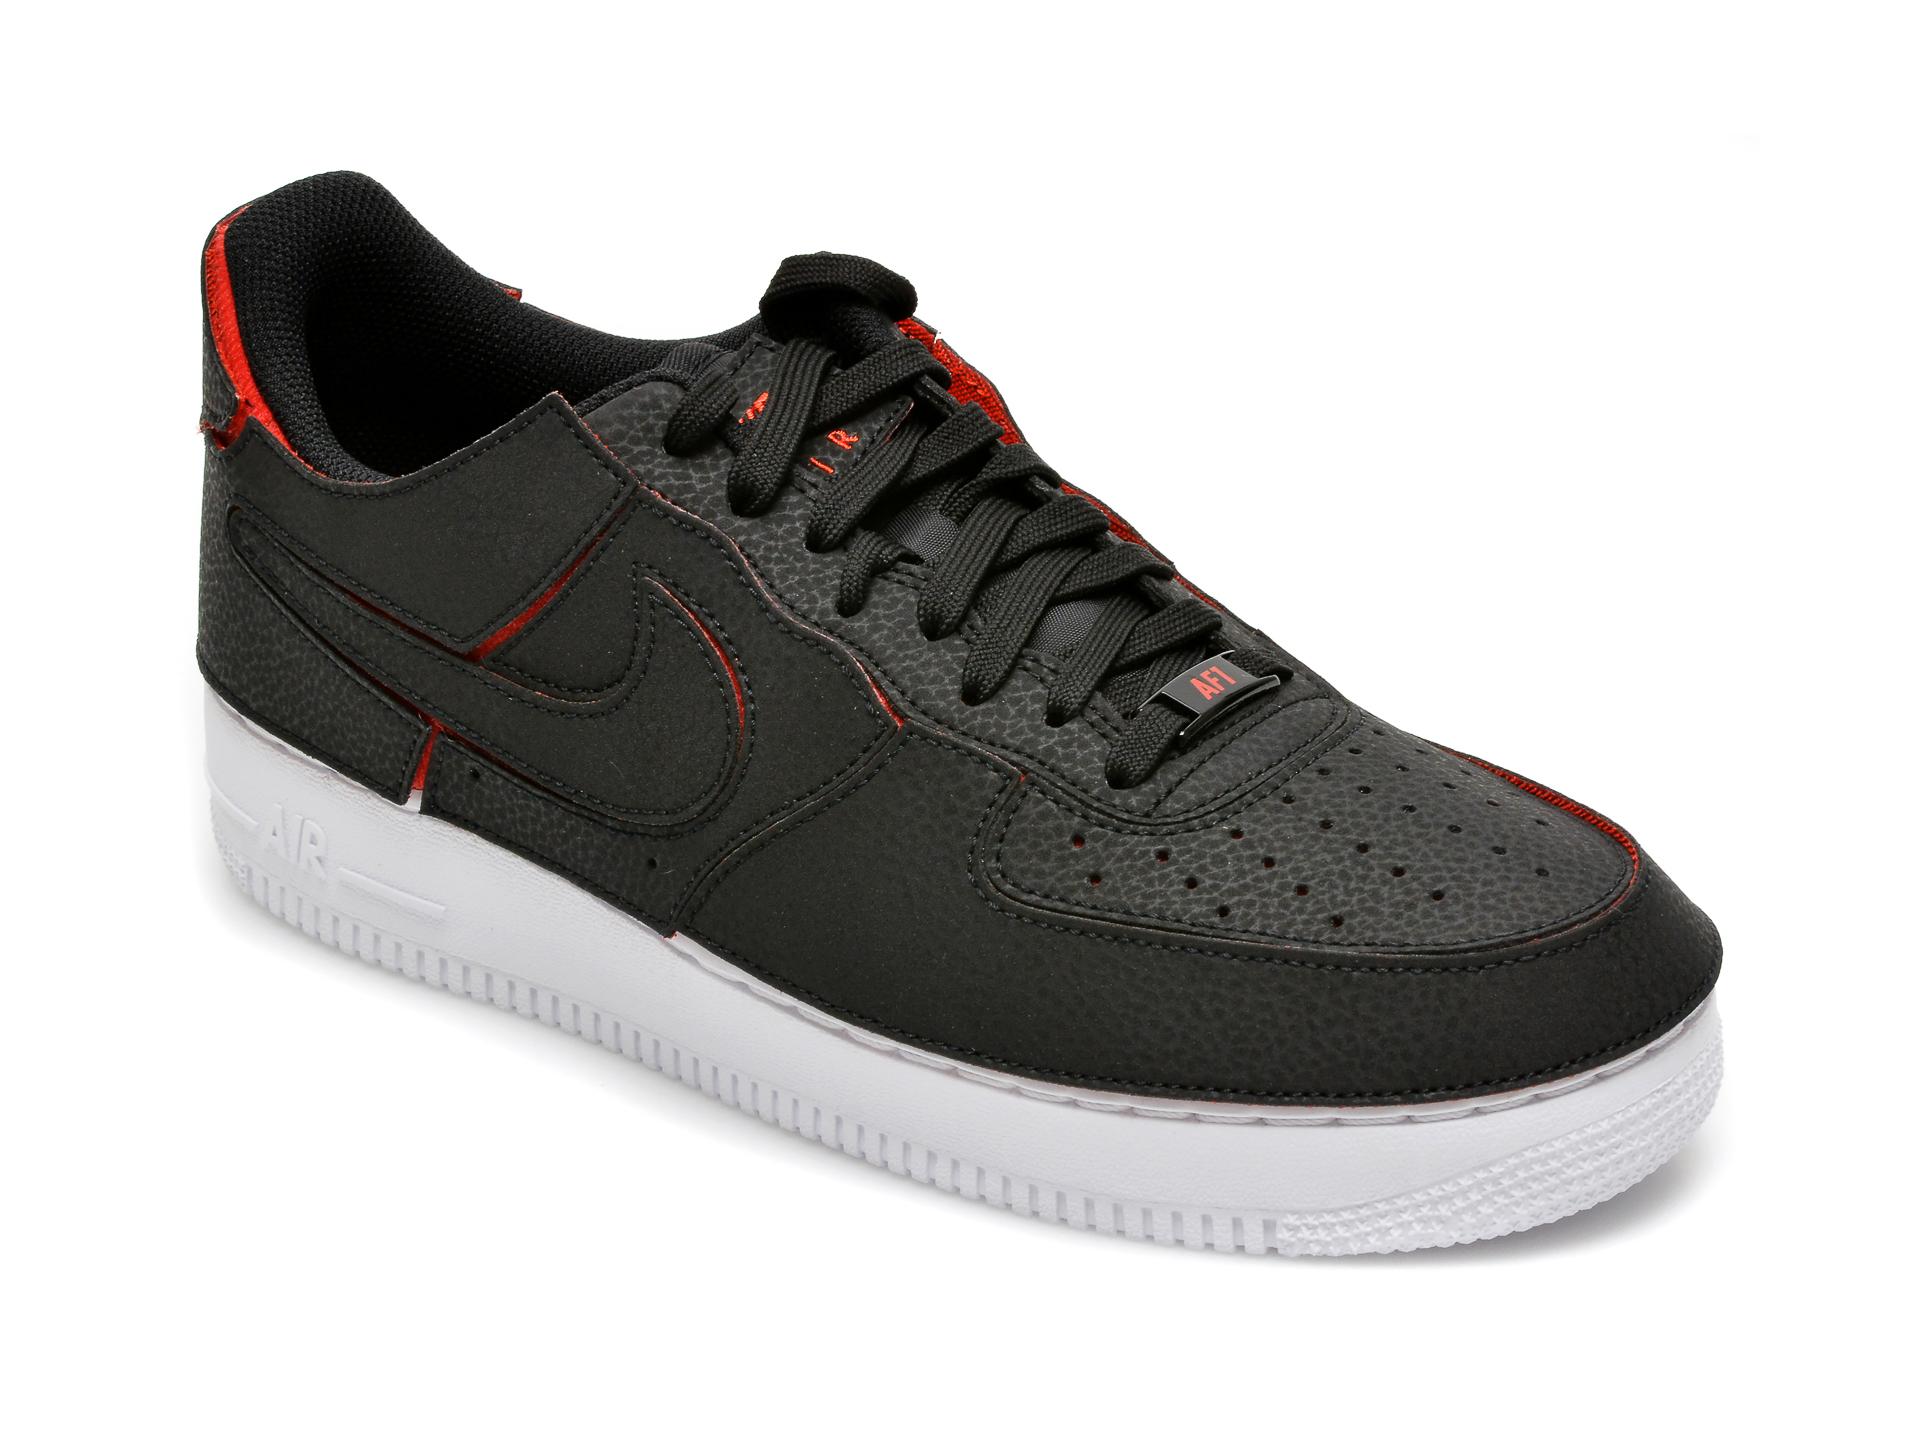 Pantofi sport NIKE negri, Nike Af1/1, din piele ecologica